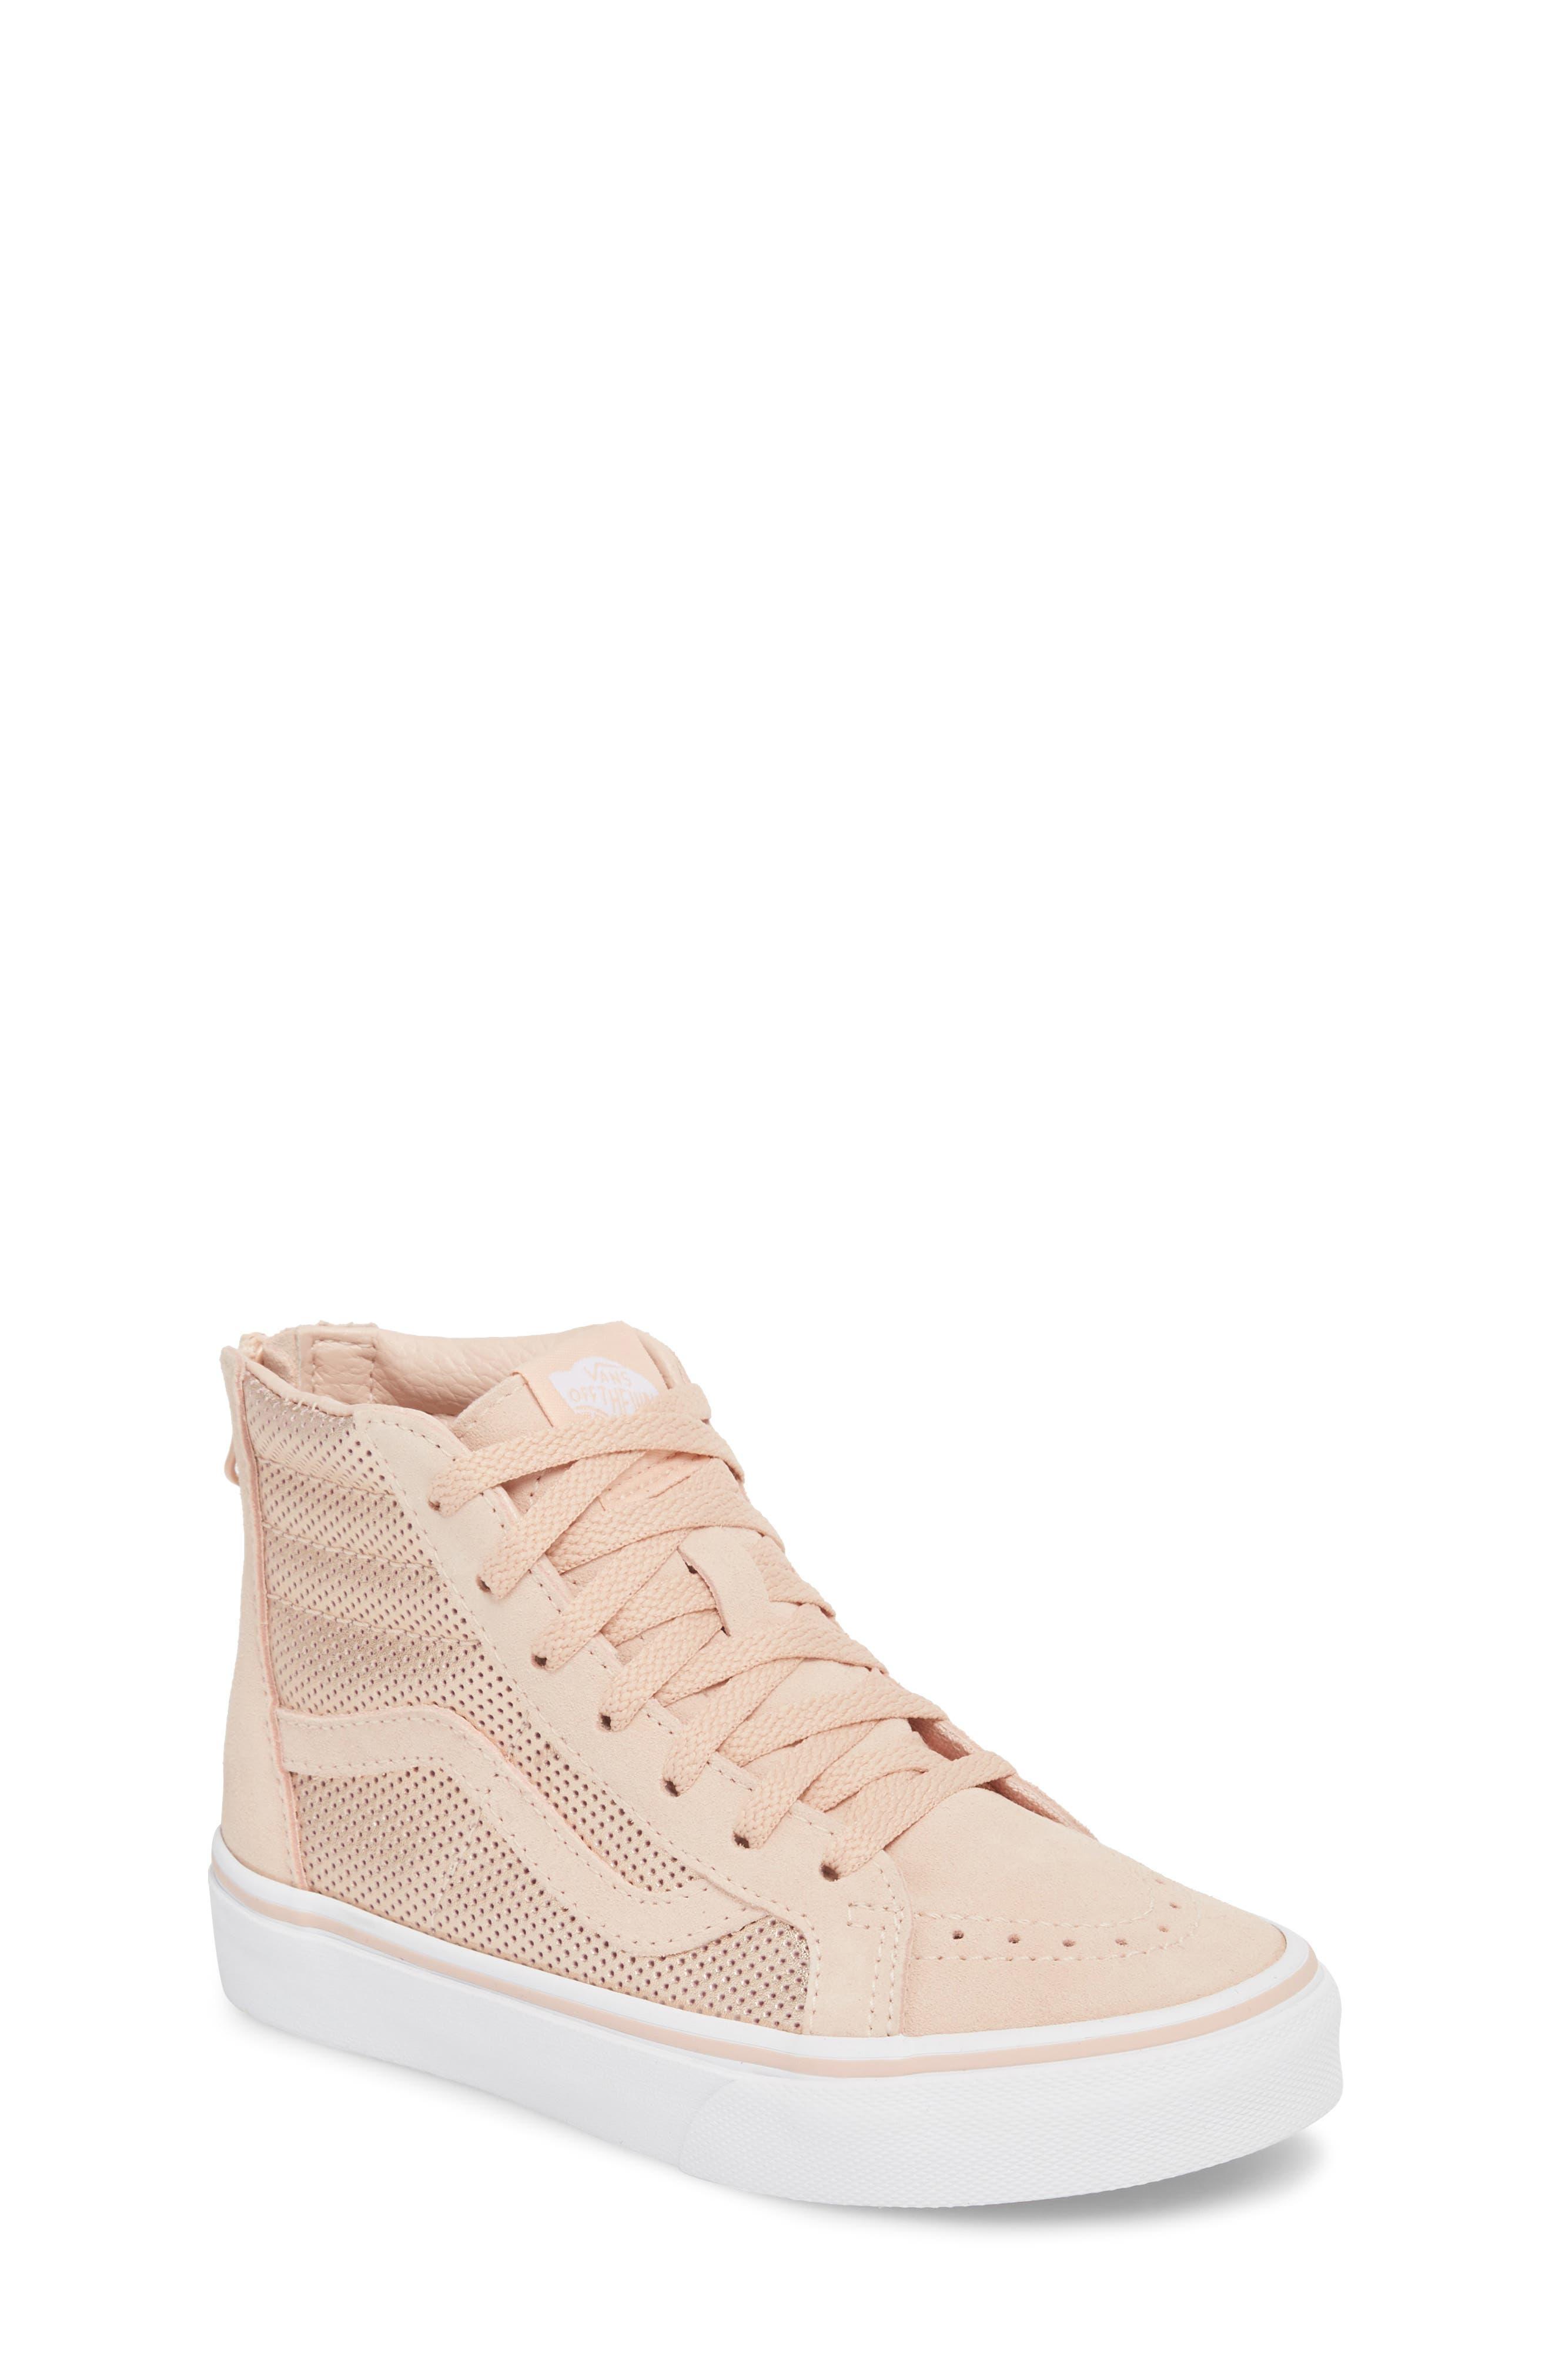 SK8-Hi Zip Sneaker,                         Main,                         color, ROSE GOLD SUEDE LEATHER